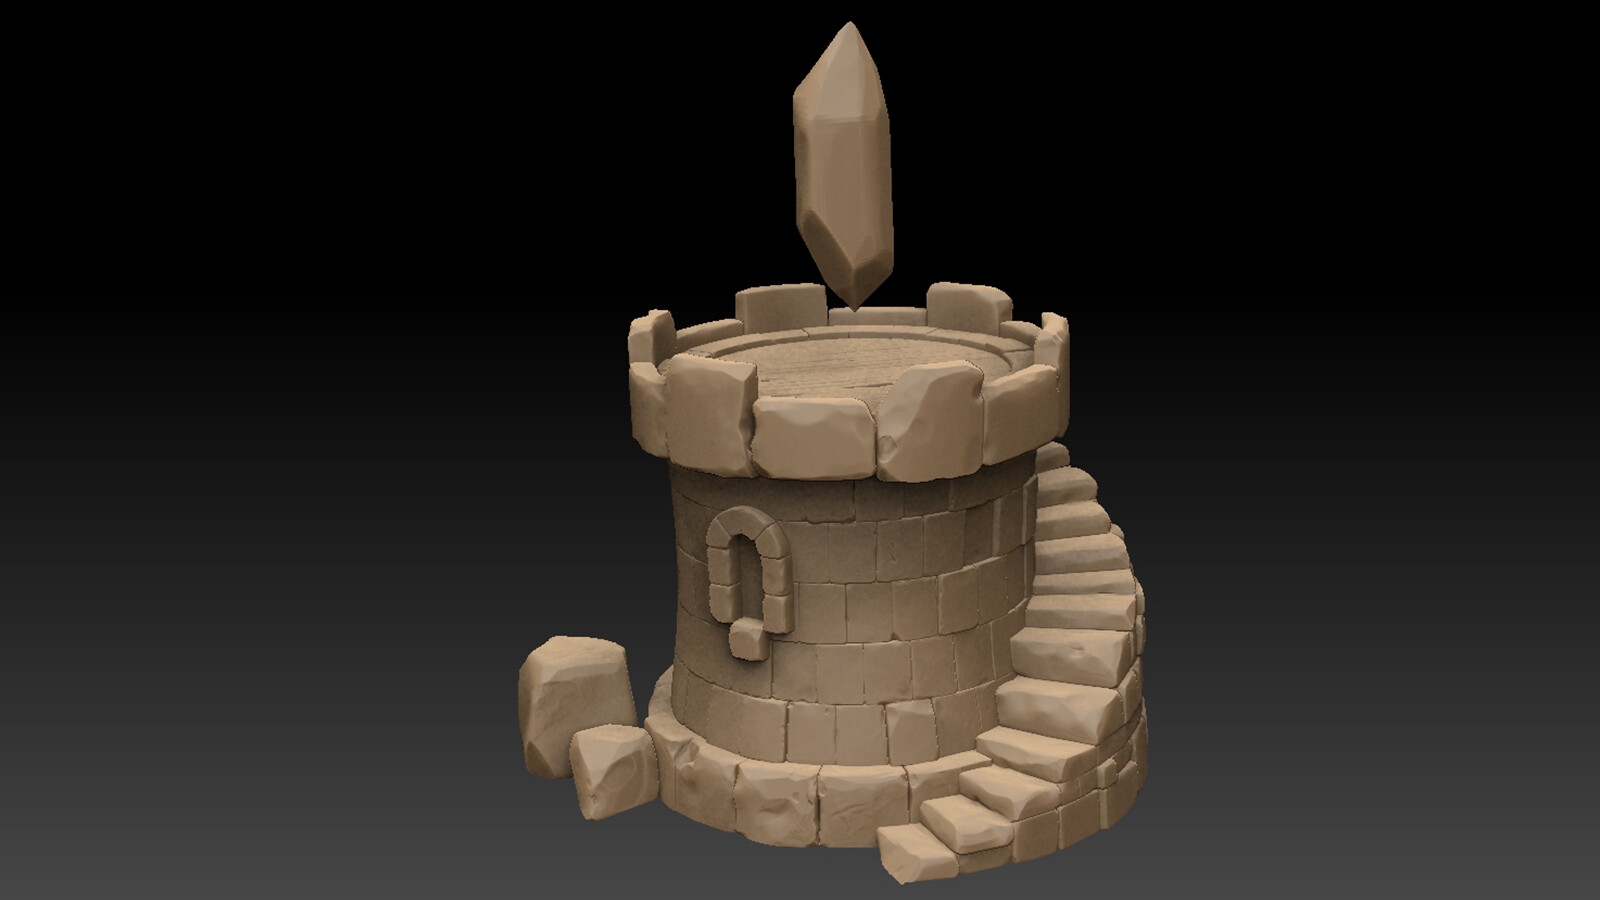 Tower Sculpt